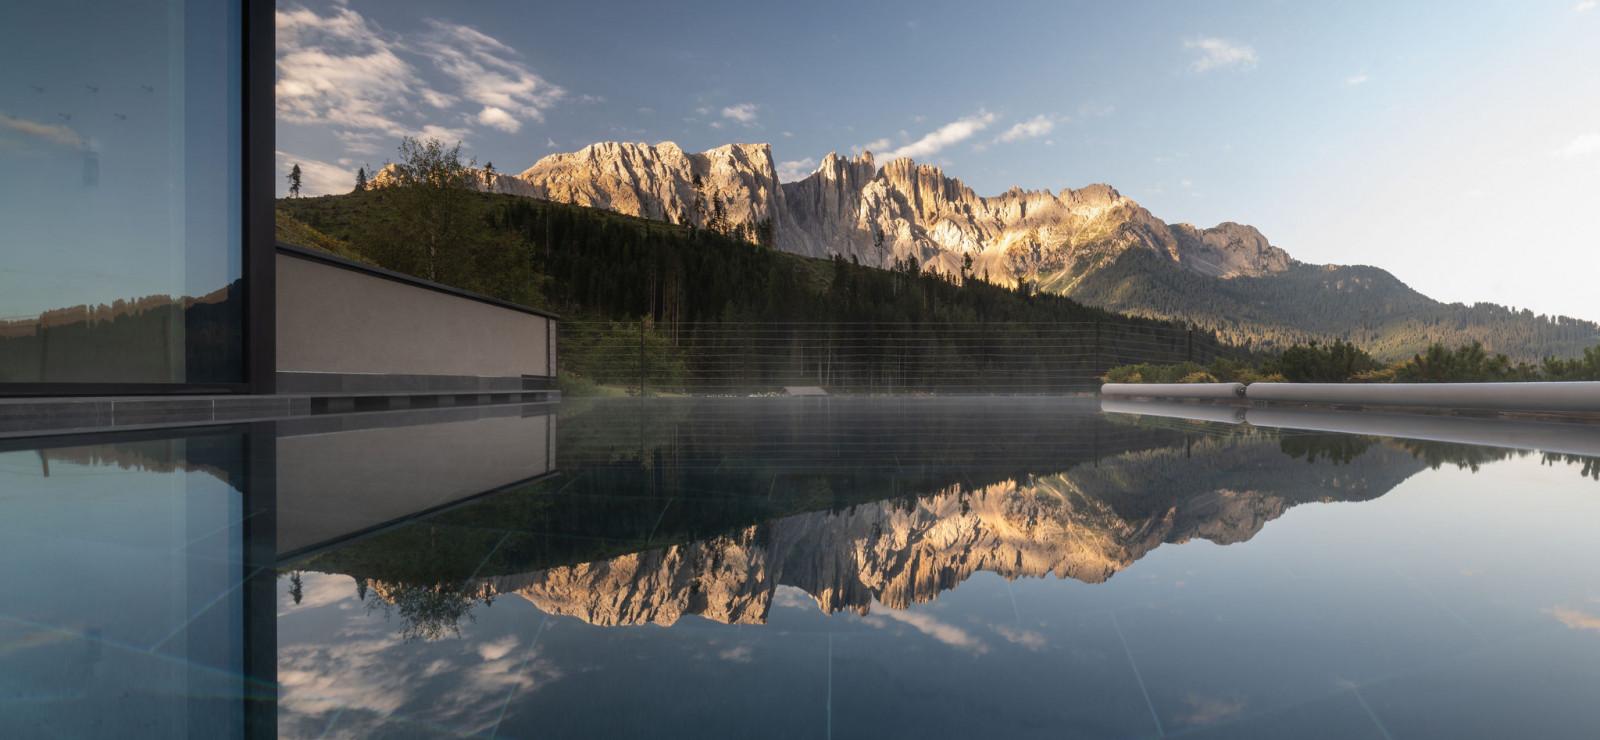 Moseralm Dolomiti Spa Resort Bilder | Bild 1